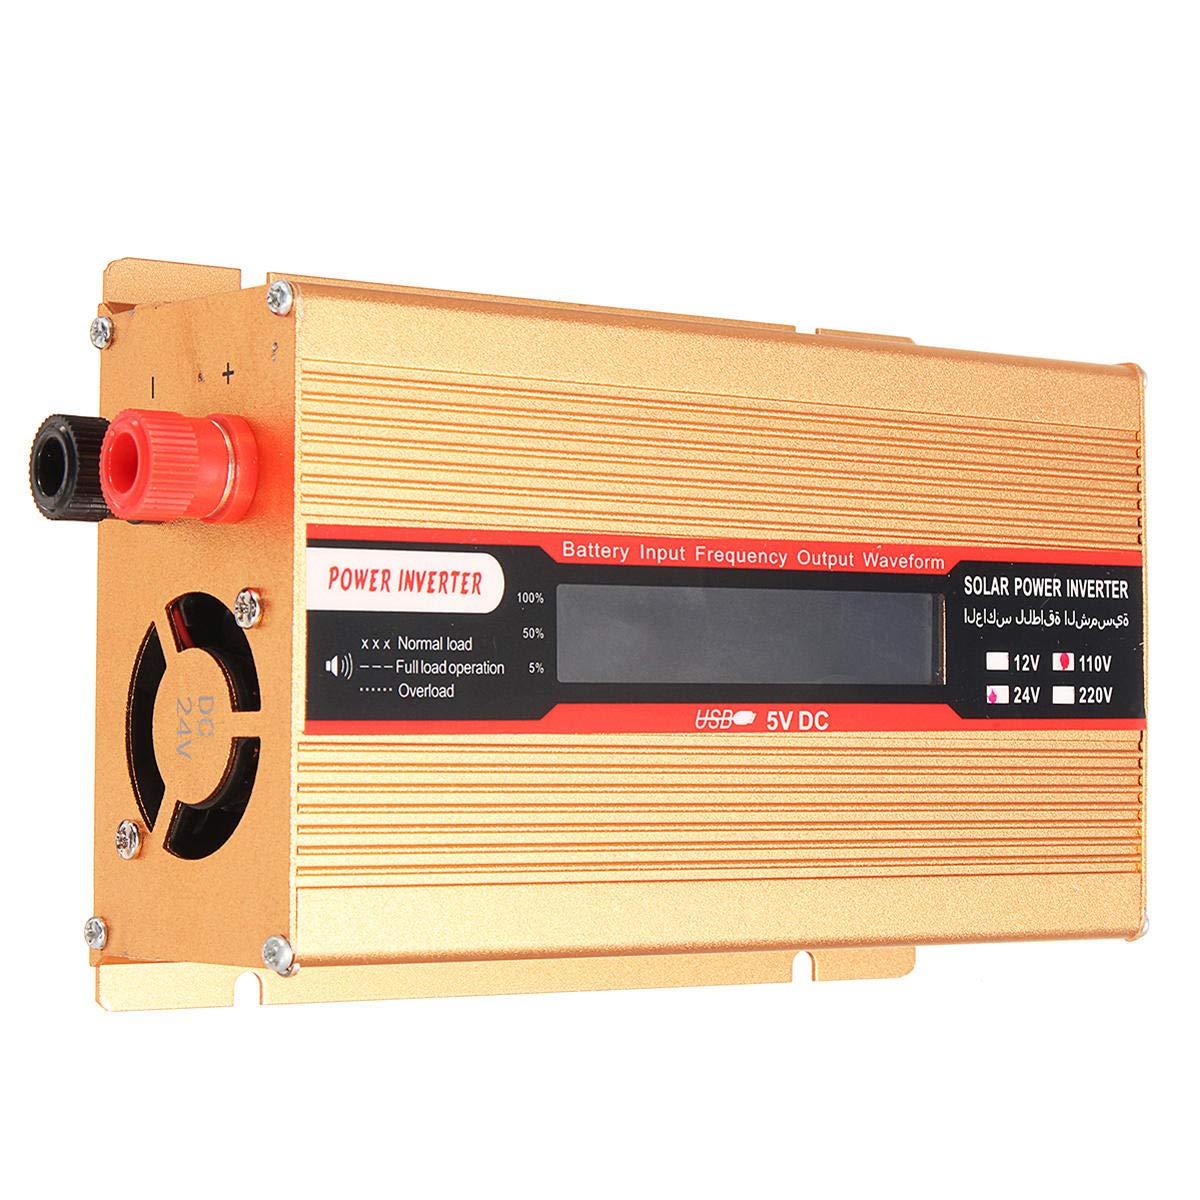 Anddoa DC 12V/24V to AC 220V/110V 1500W Solar Power Inverter Modified Sine Wave LCD Voltage Display - 12V-220V